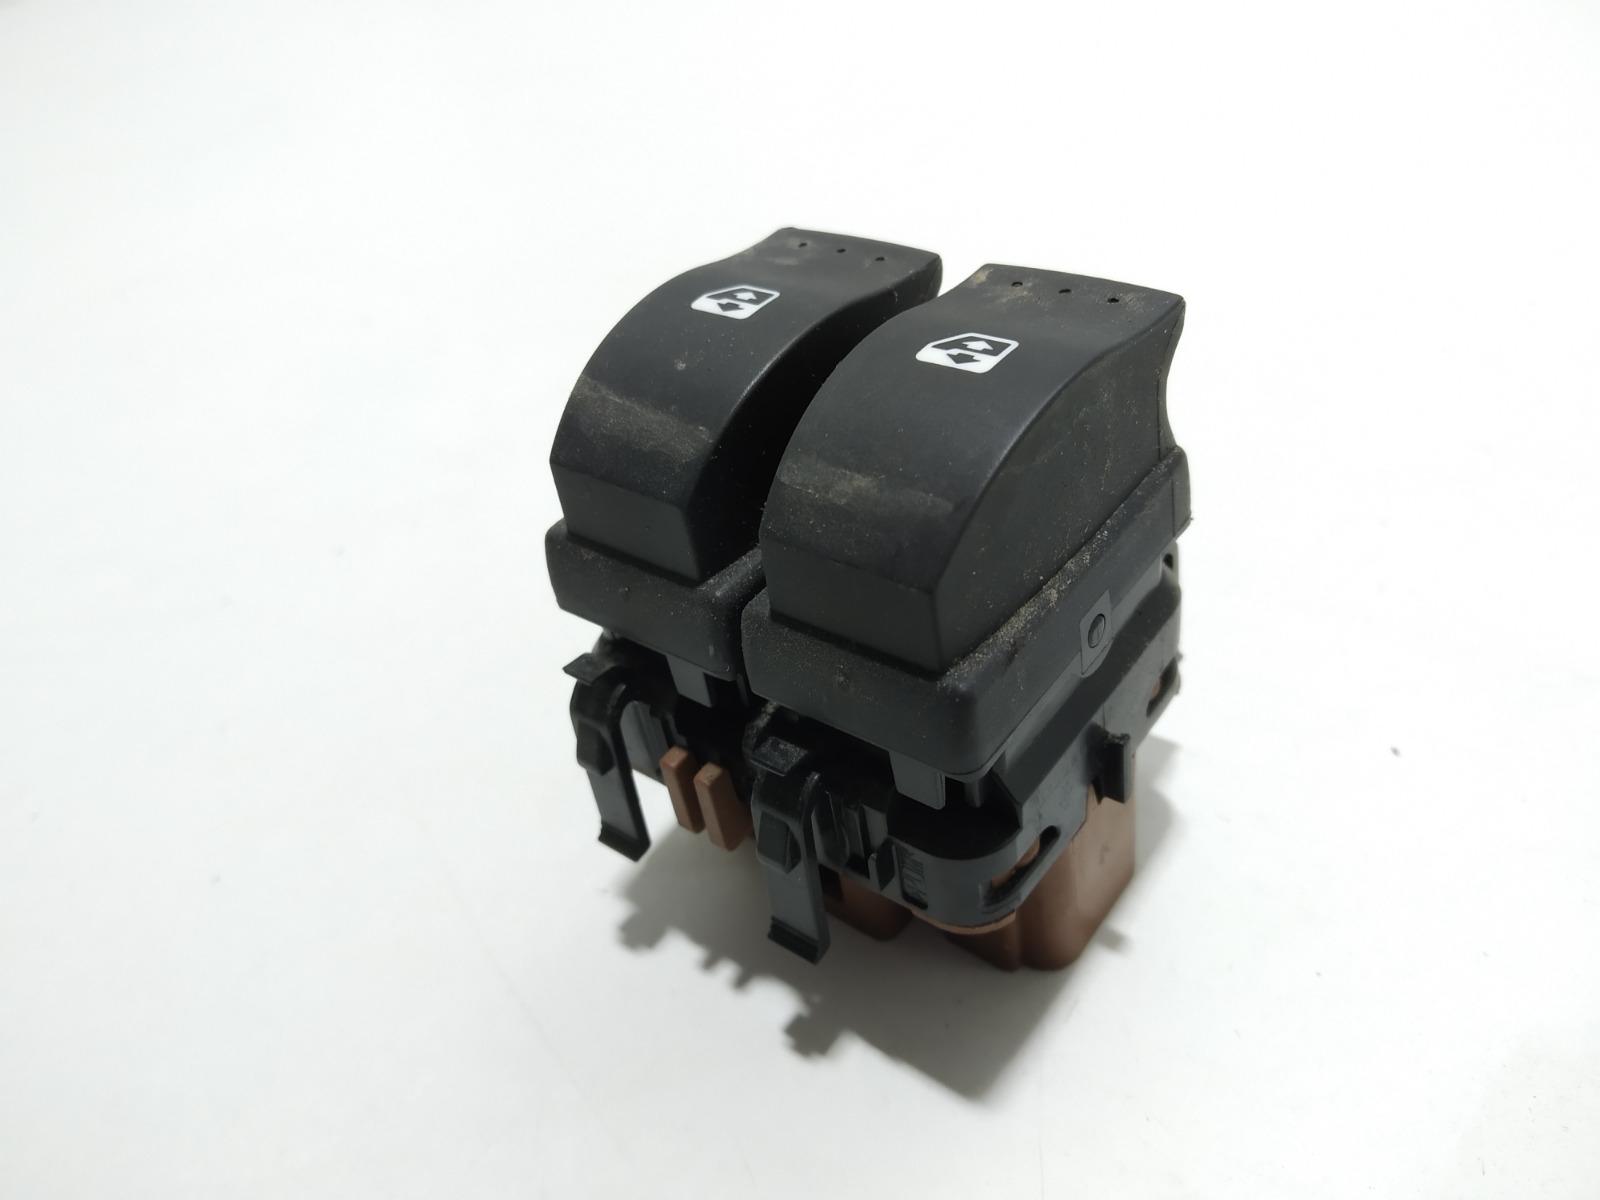 Кнопка стеклоподъемника Renault Laguna 2.0 I 2007 (б/у)